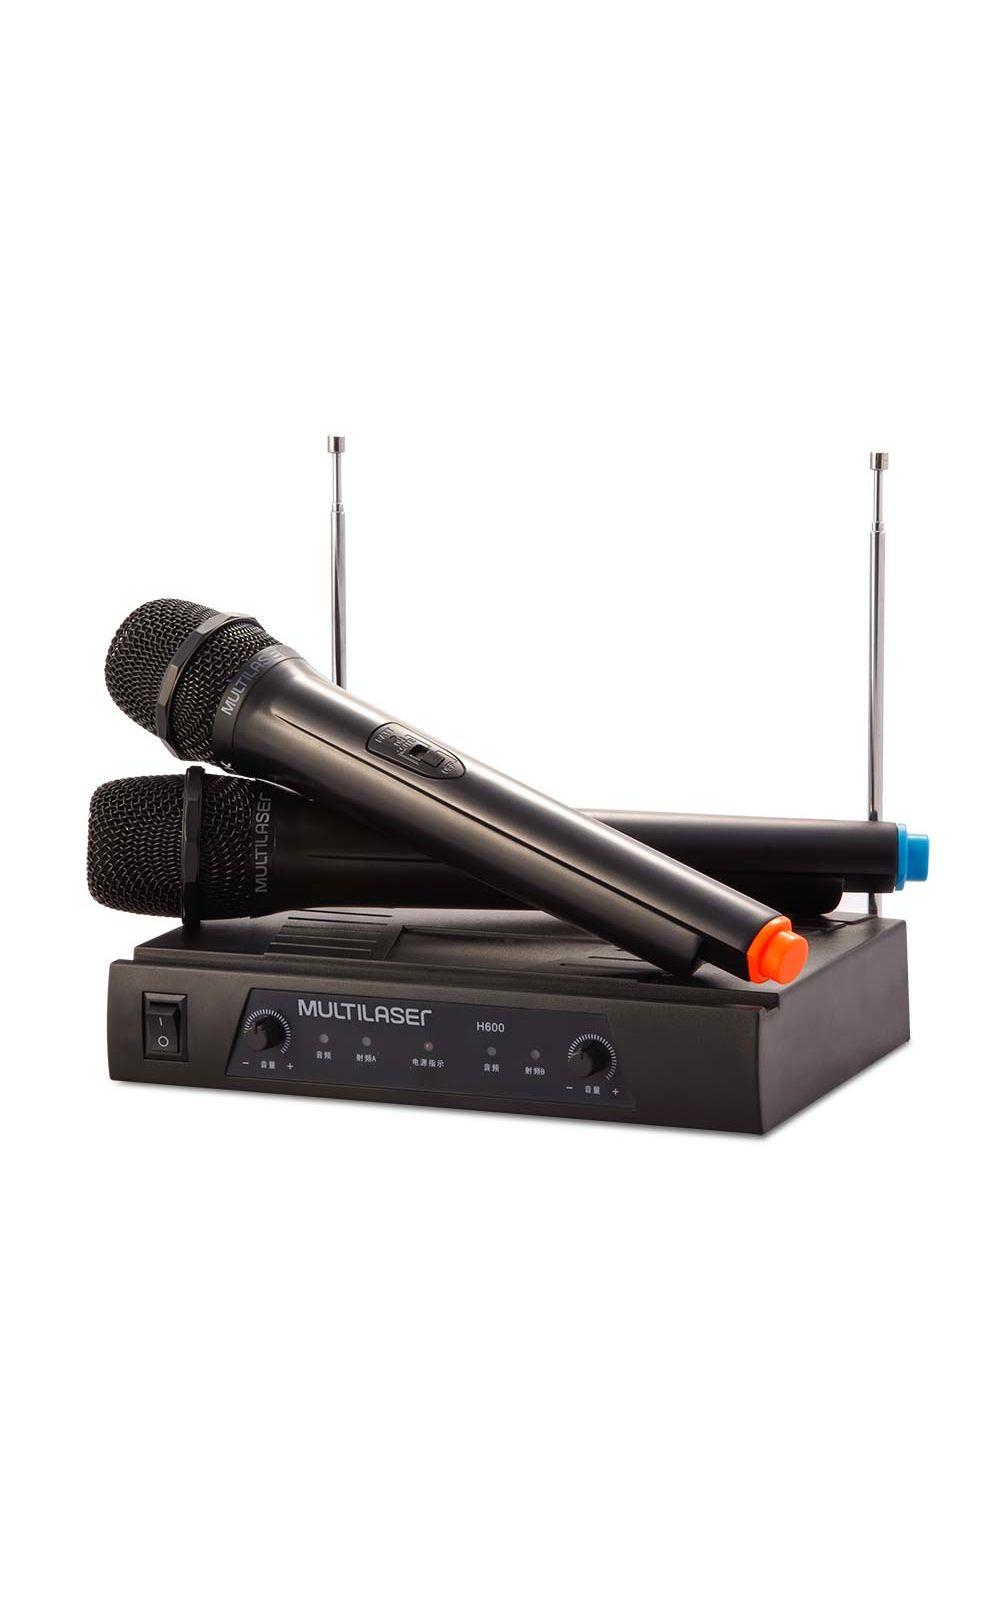 Foto 1 - Par de Microfone sem Fio Alcance de até 8M + Receiver Preto Multilaser - SP328